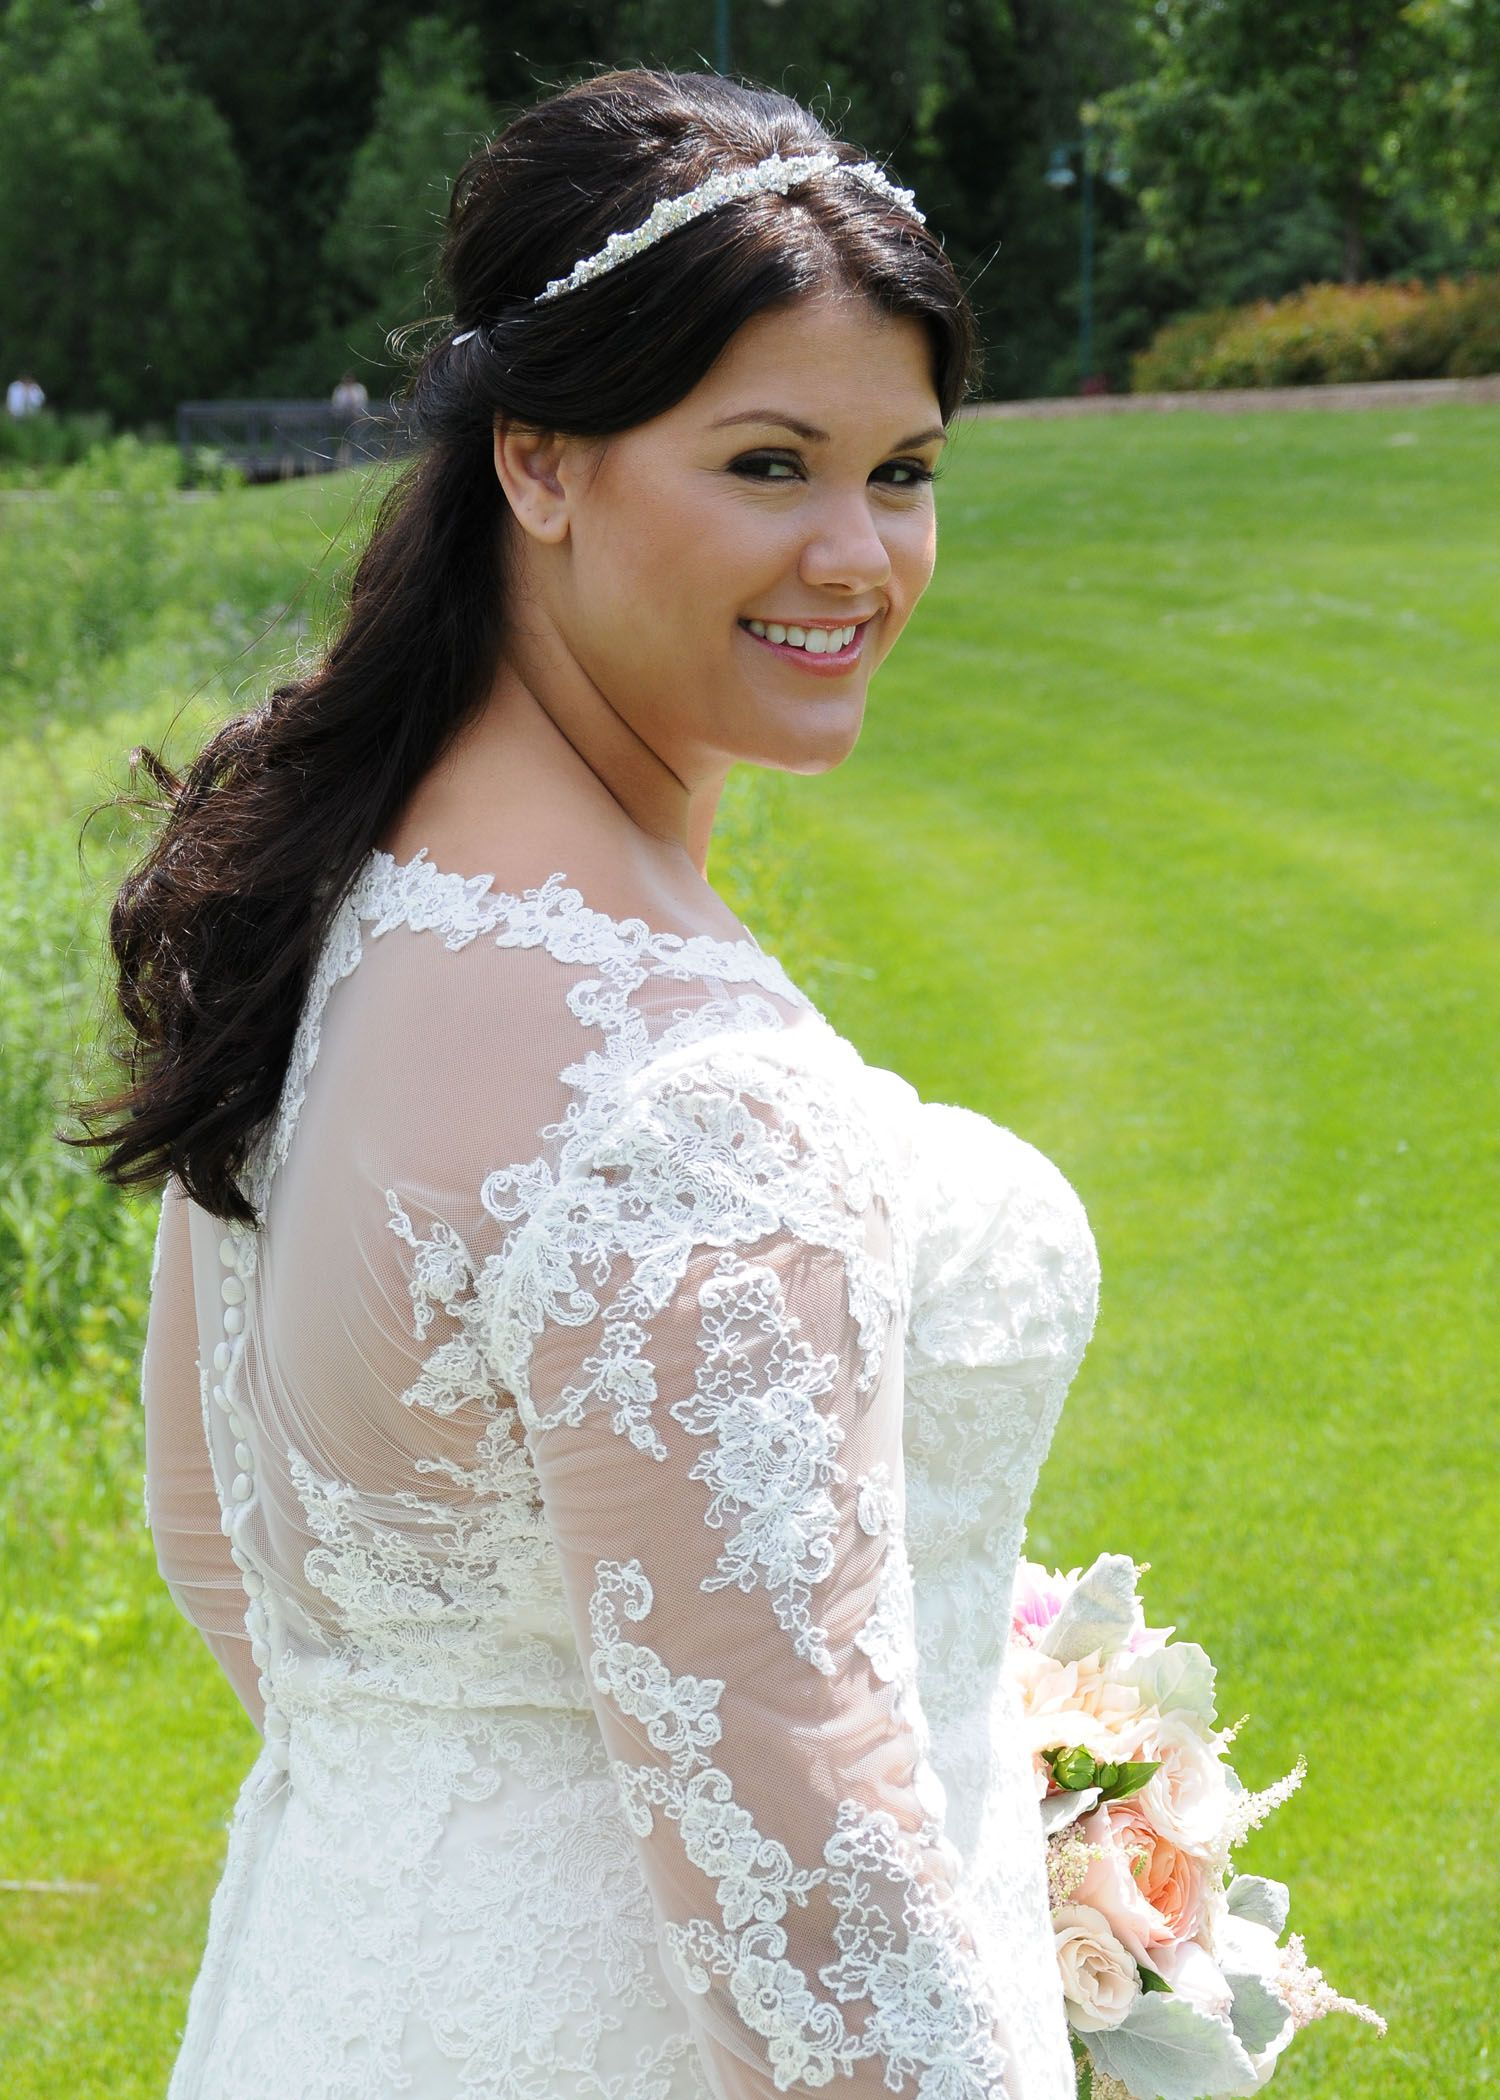 Plus size wedding gown, Curvy Brides, Luxe Bridal, Curvy ...